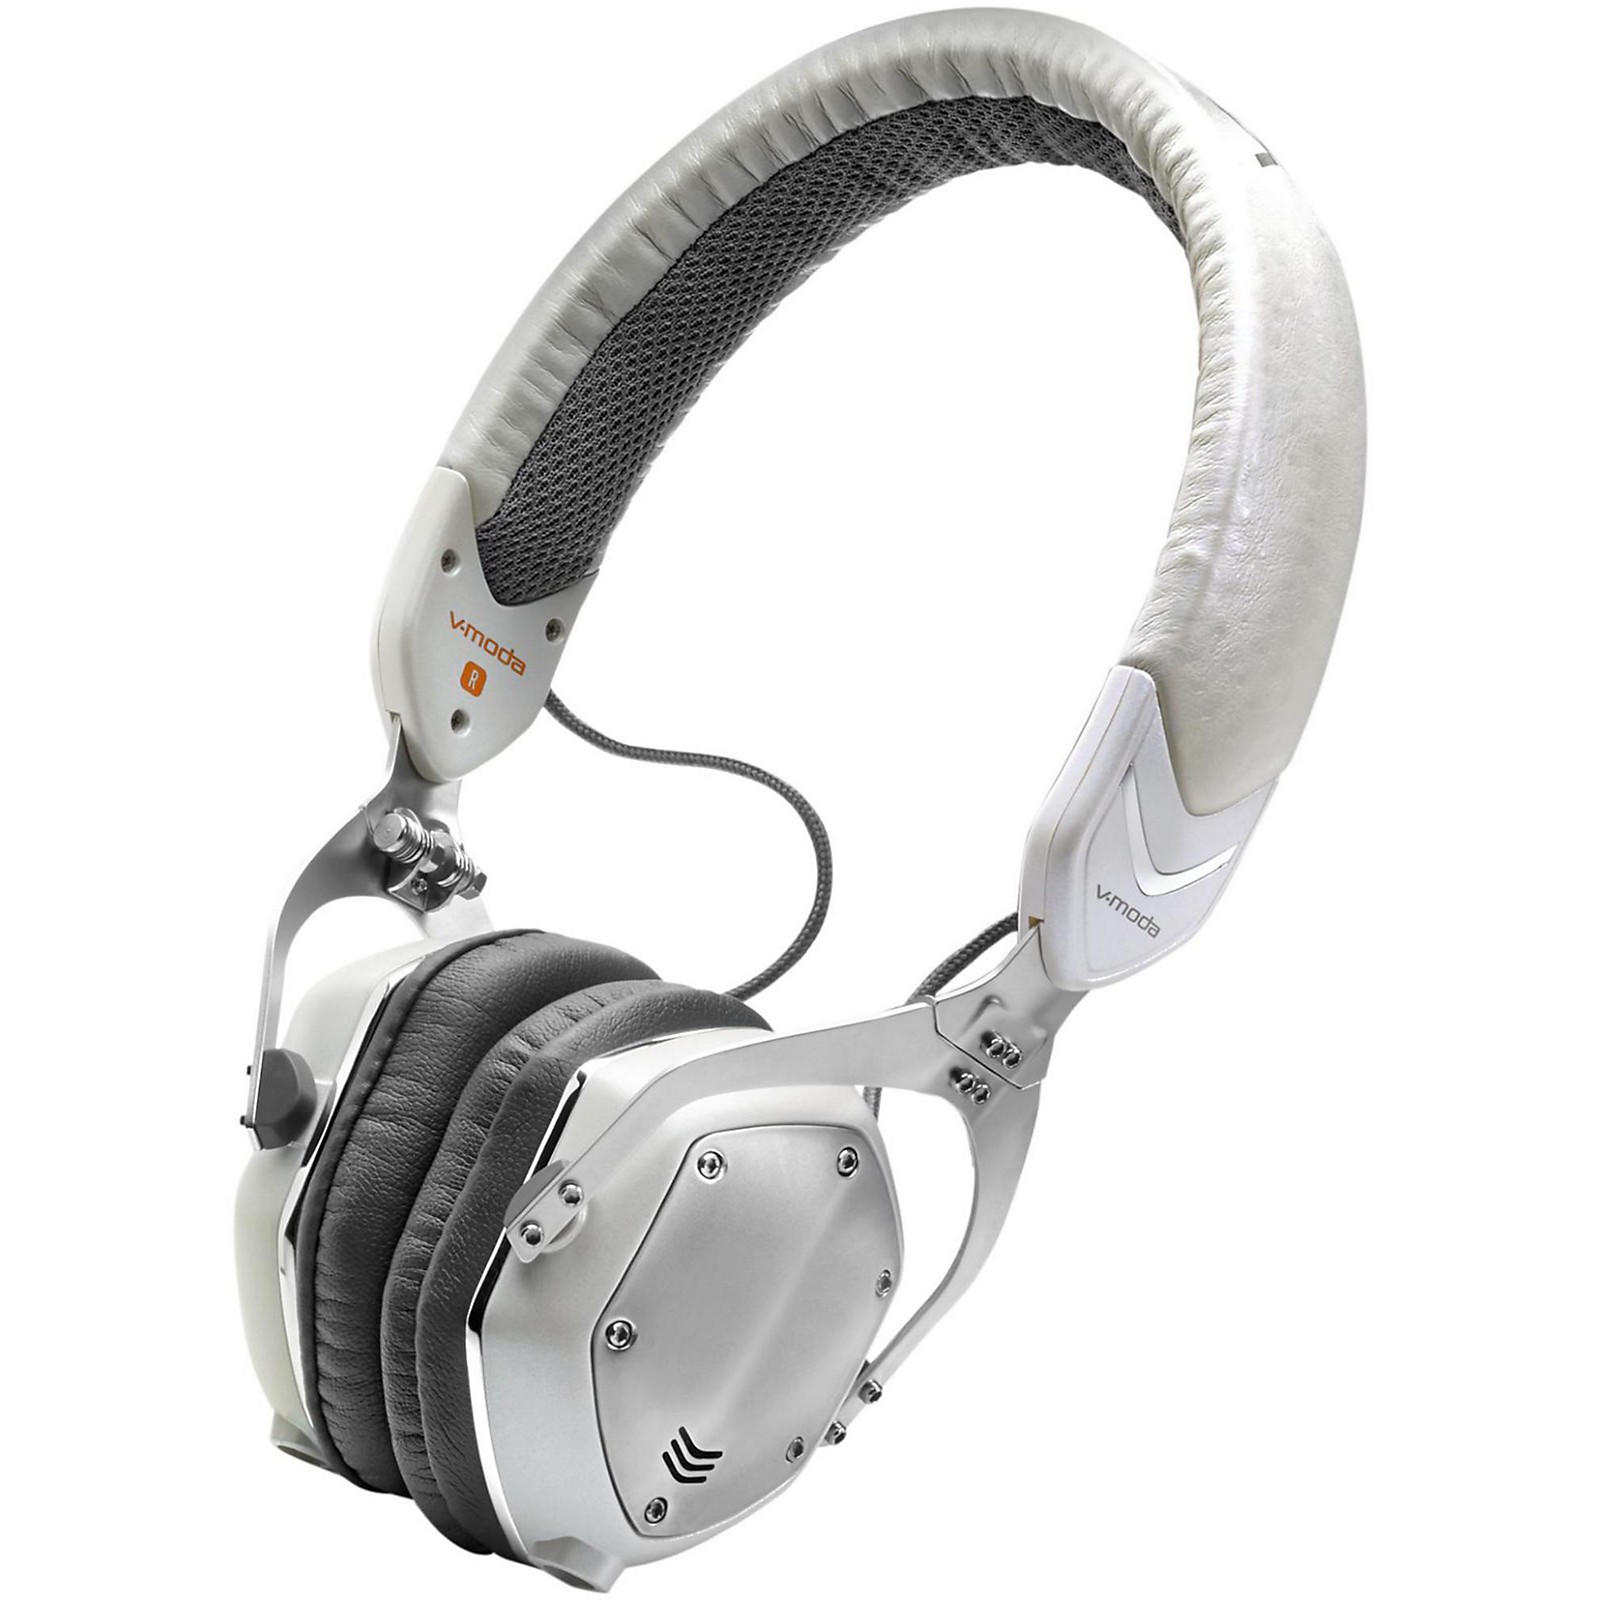 Open Box V-MODA XS On-Ear Folding Design Noise-Isolating Metal Headphone